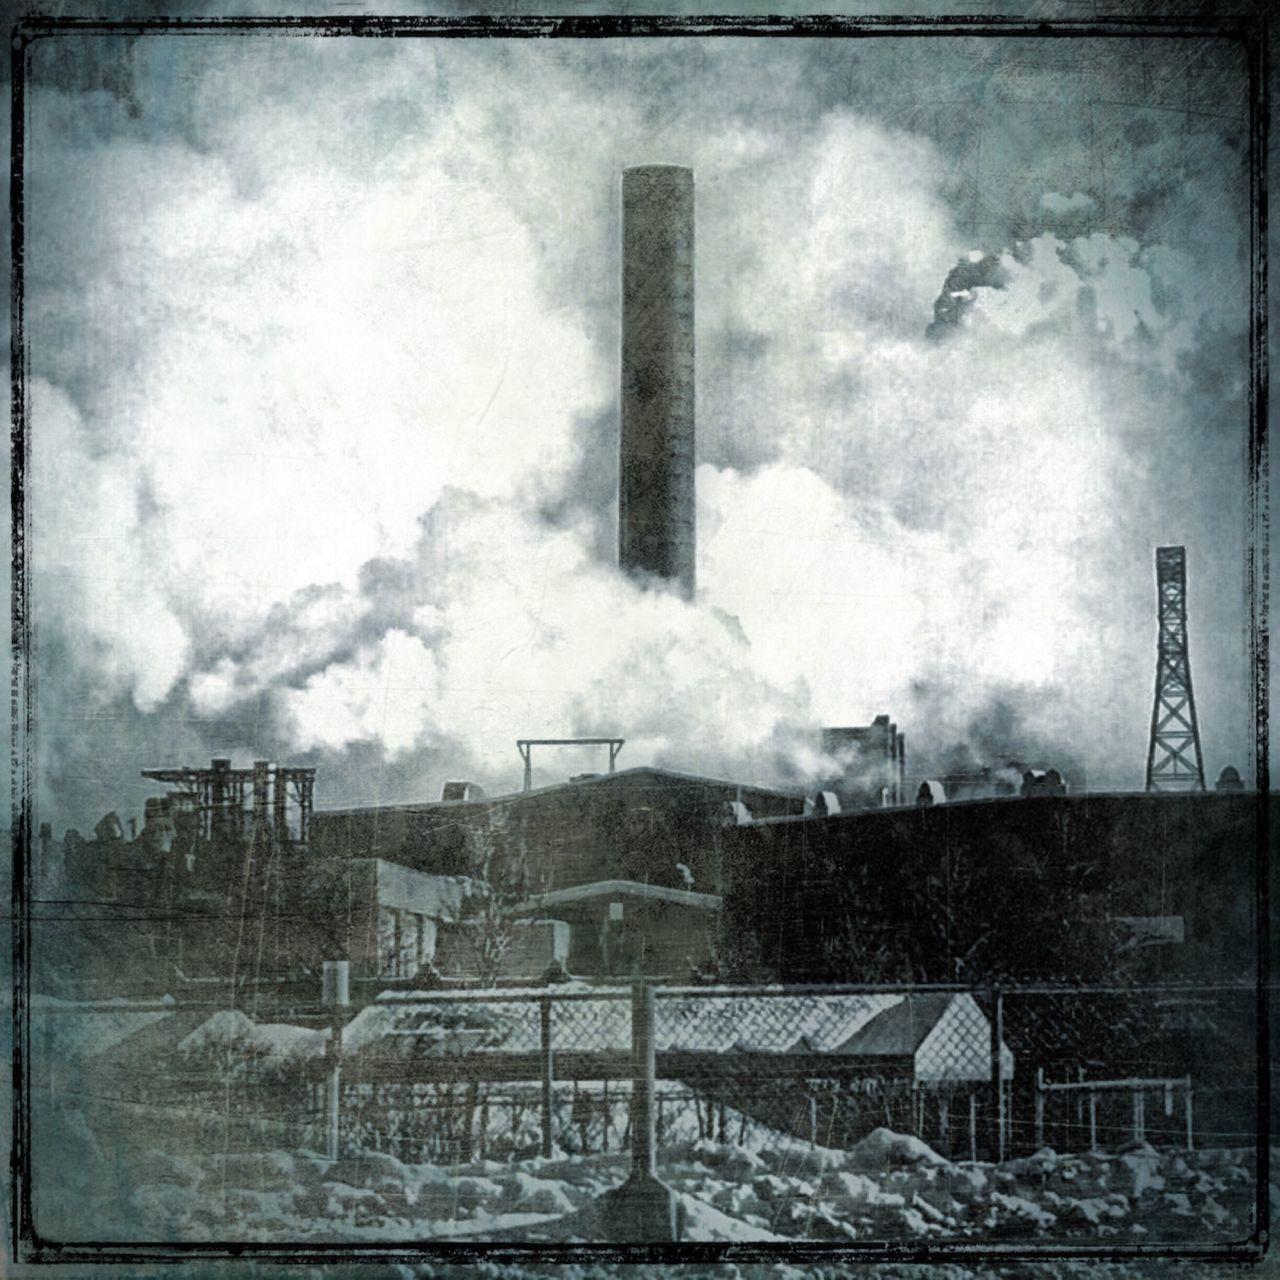 Chimney Smoke Industrial Landscapes Blackandwhite